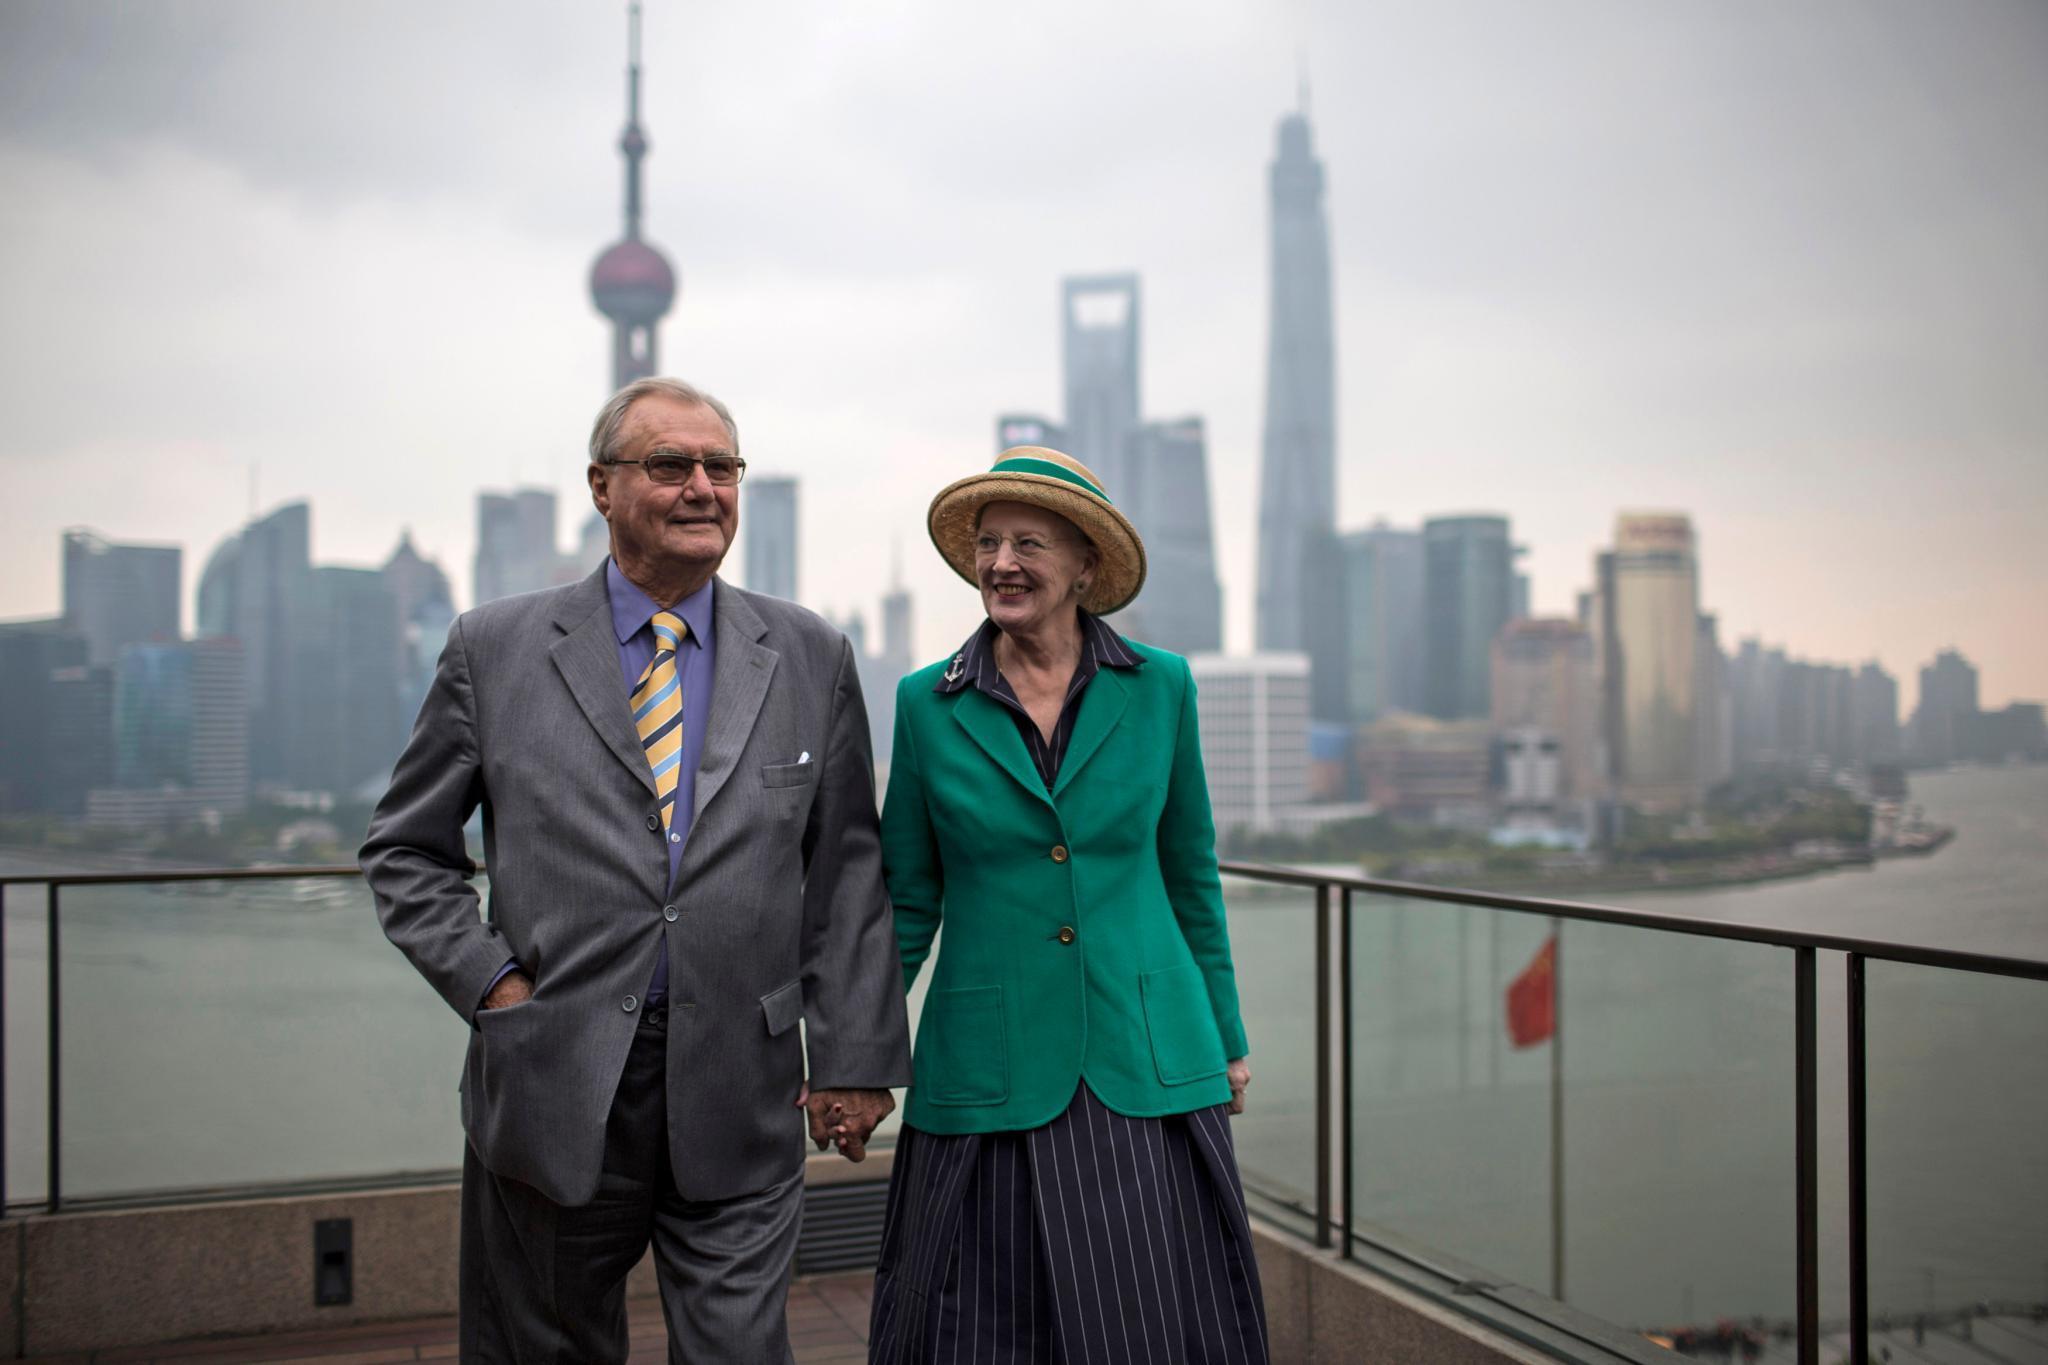 Prinz Henrik + Königin Margrethe 2014 in Shanghai